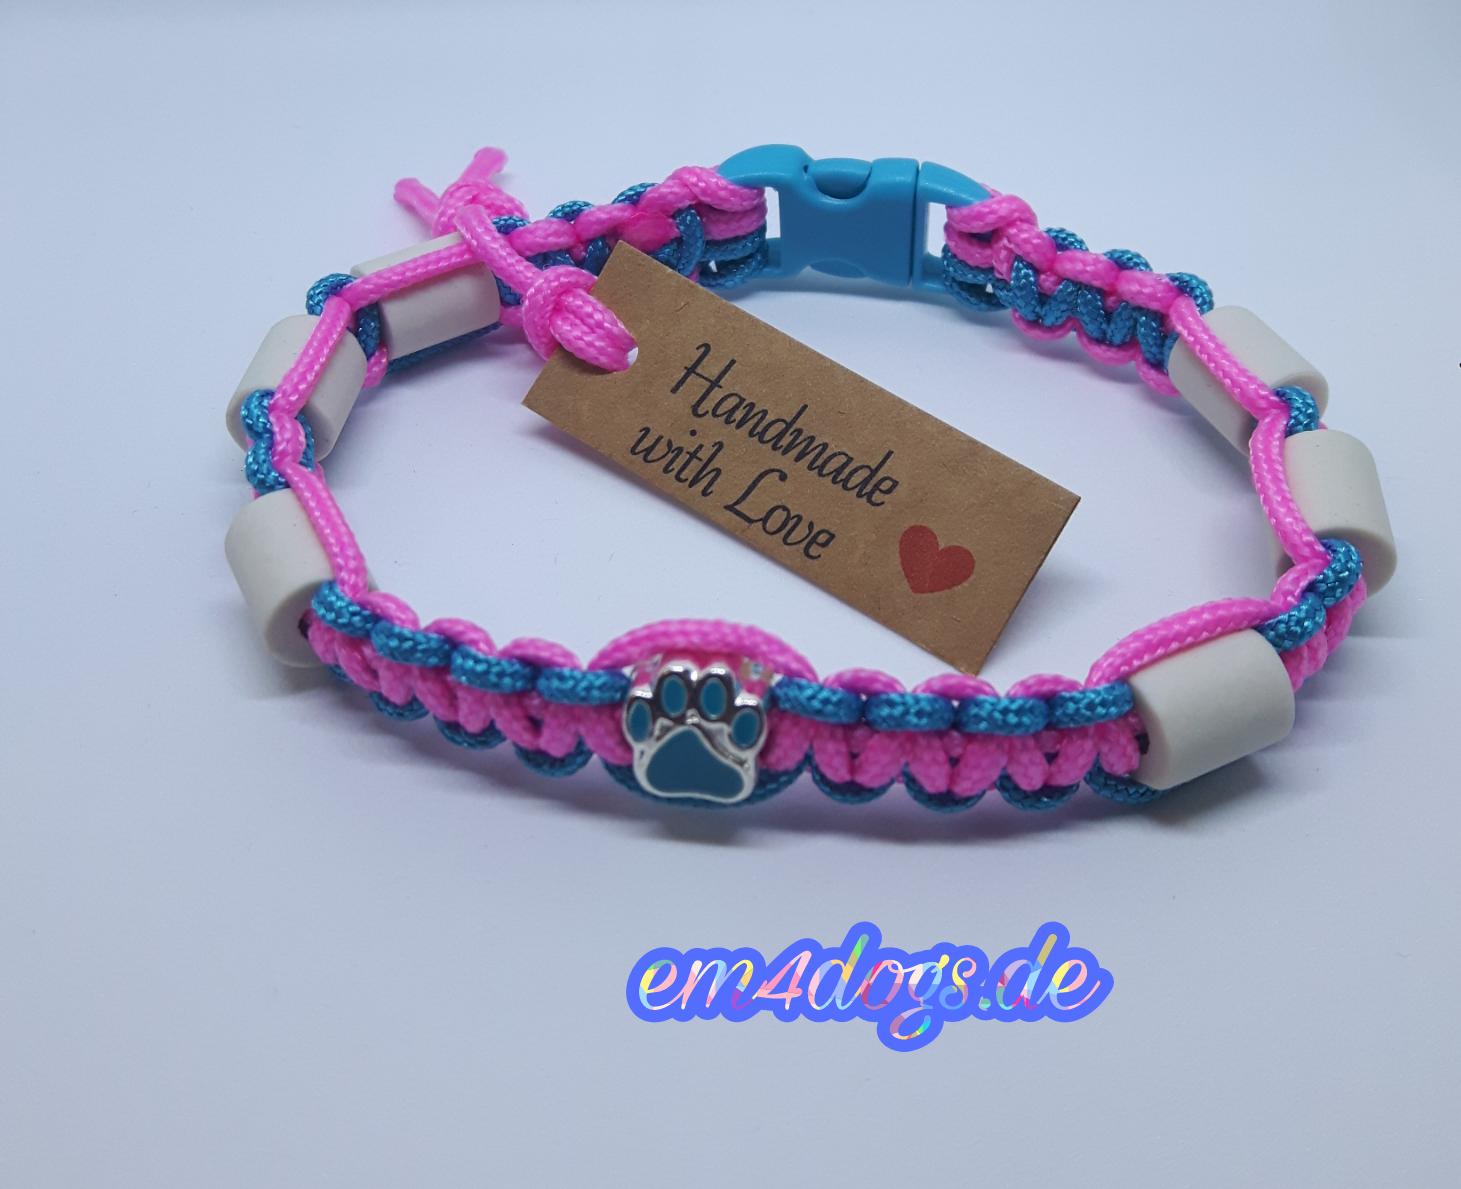 em4dogs.de EM-Keramik Hundehalsband türkis pink